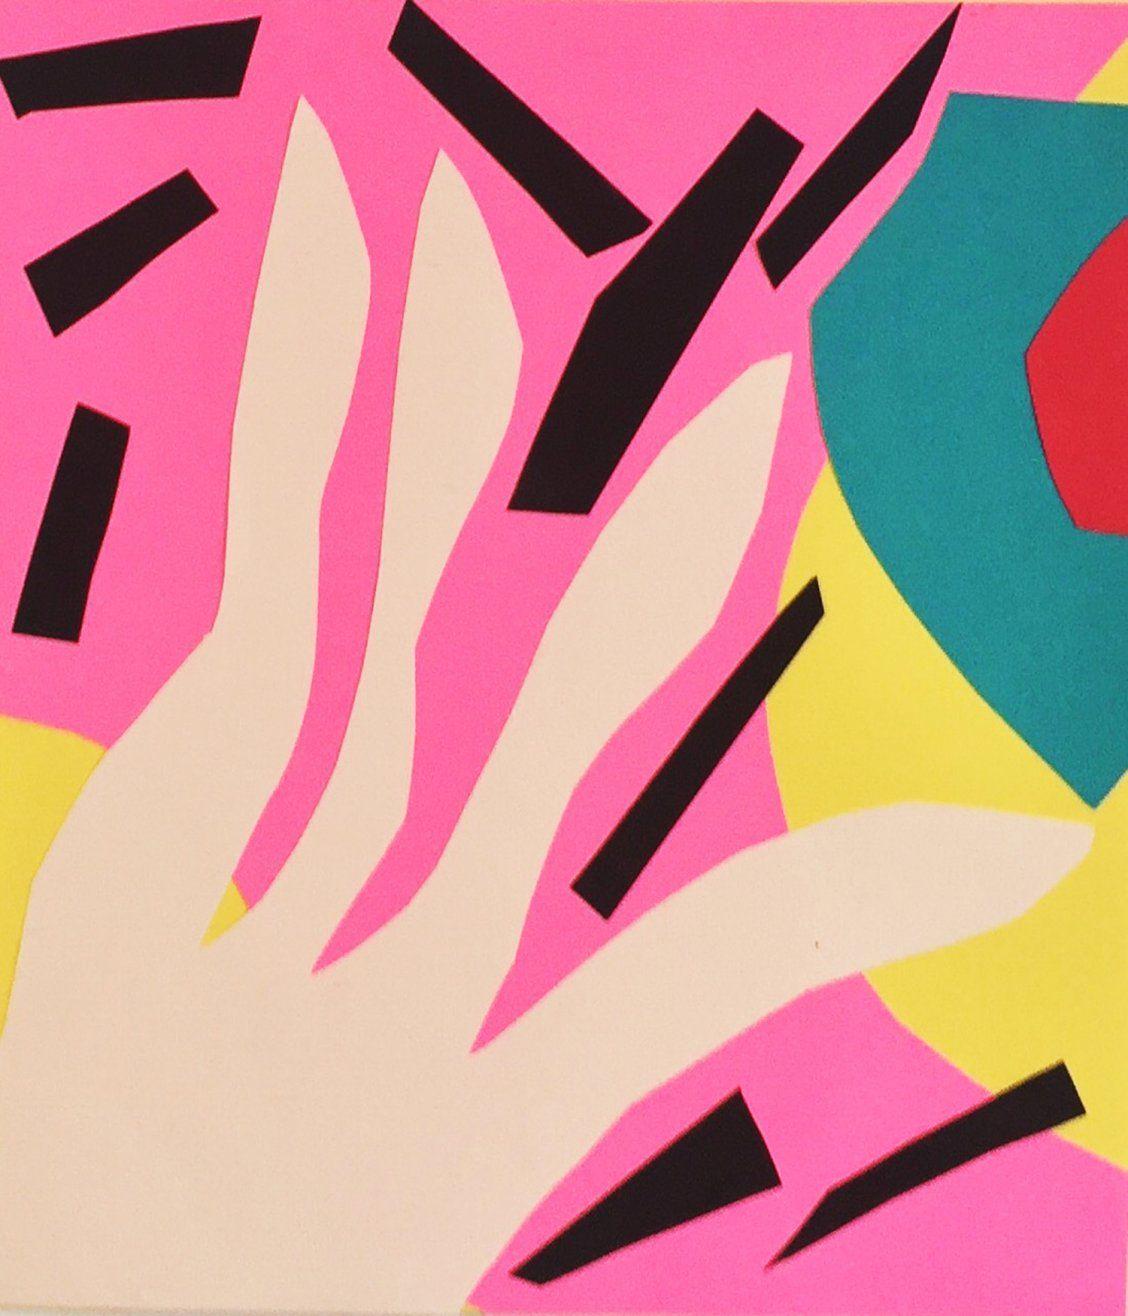 """Pink Afternoon"" Art by Tuxedo Friday on Society6 | Society6 thumbnail"